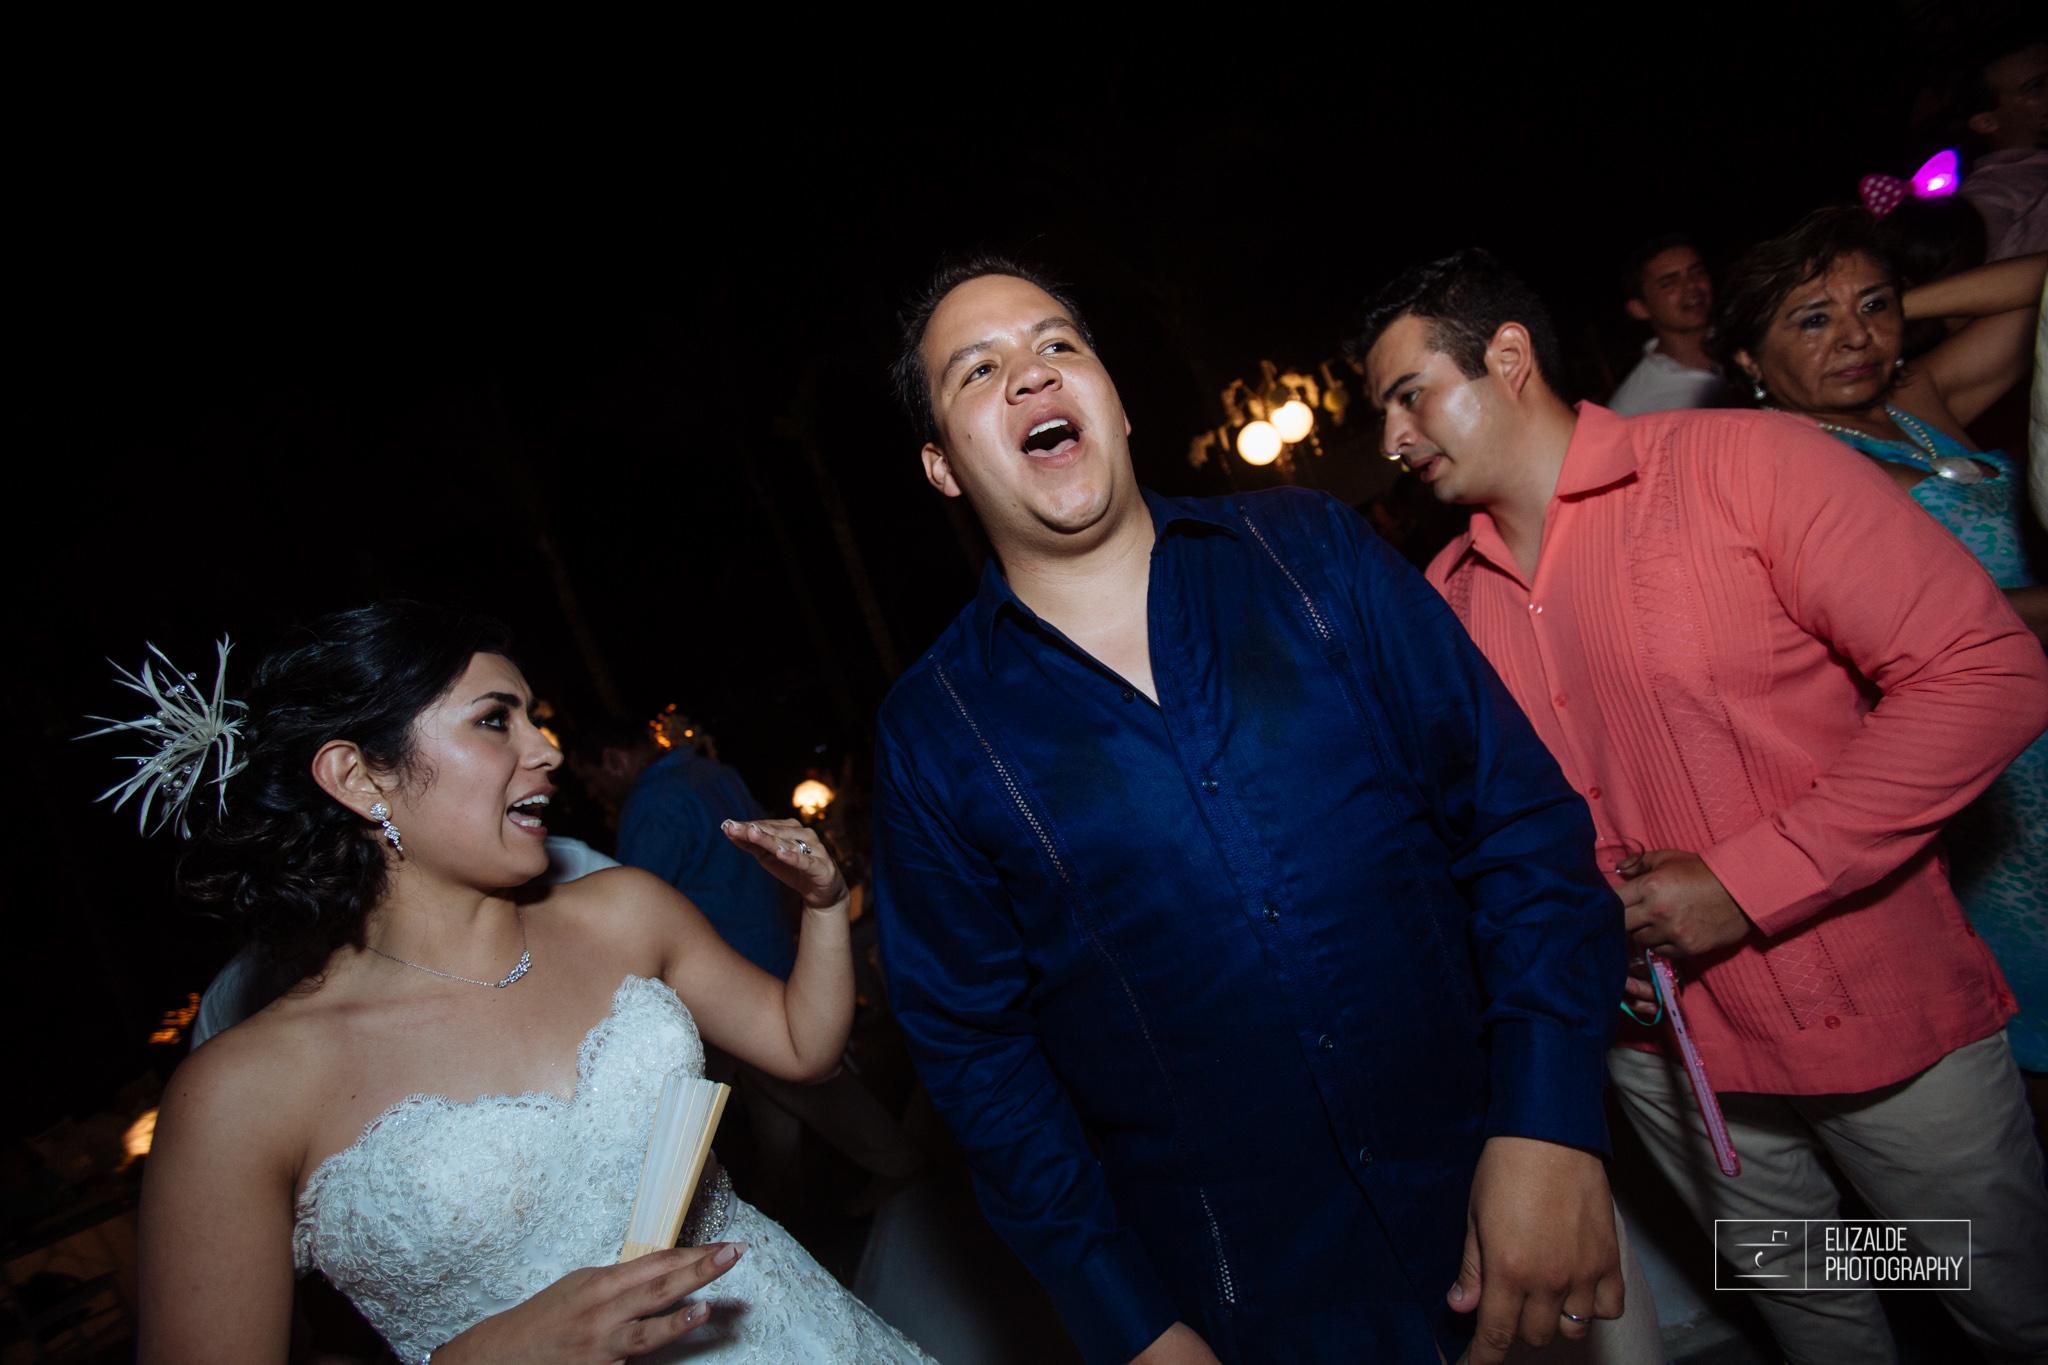 Pay and Ferran_Acapulco_Destination Wedding_Elizalde Photography-124.jpg